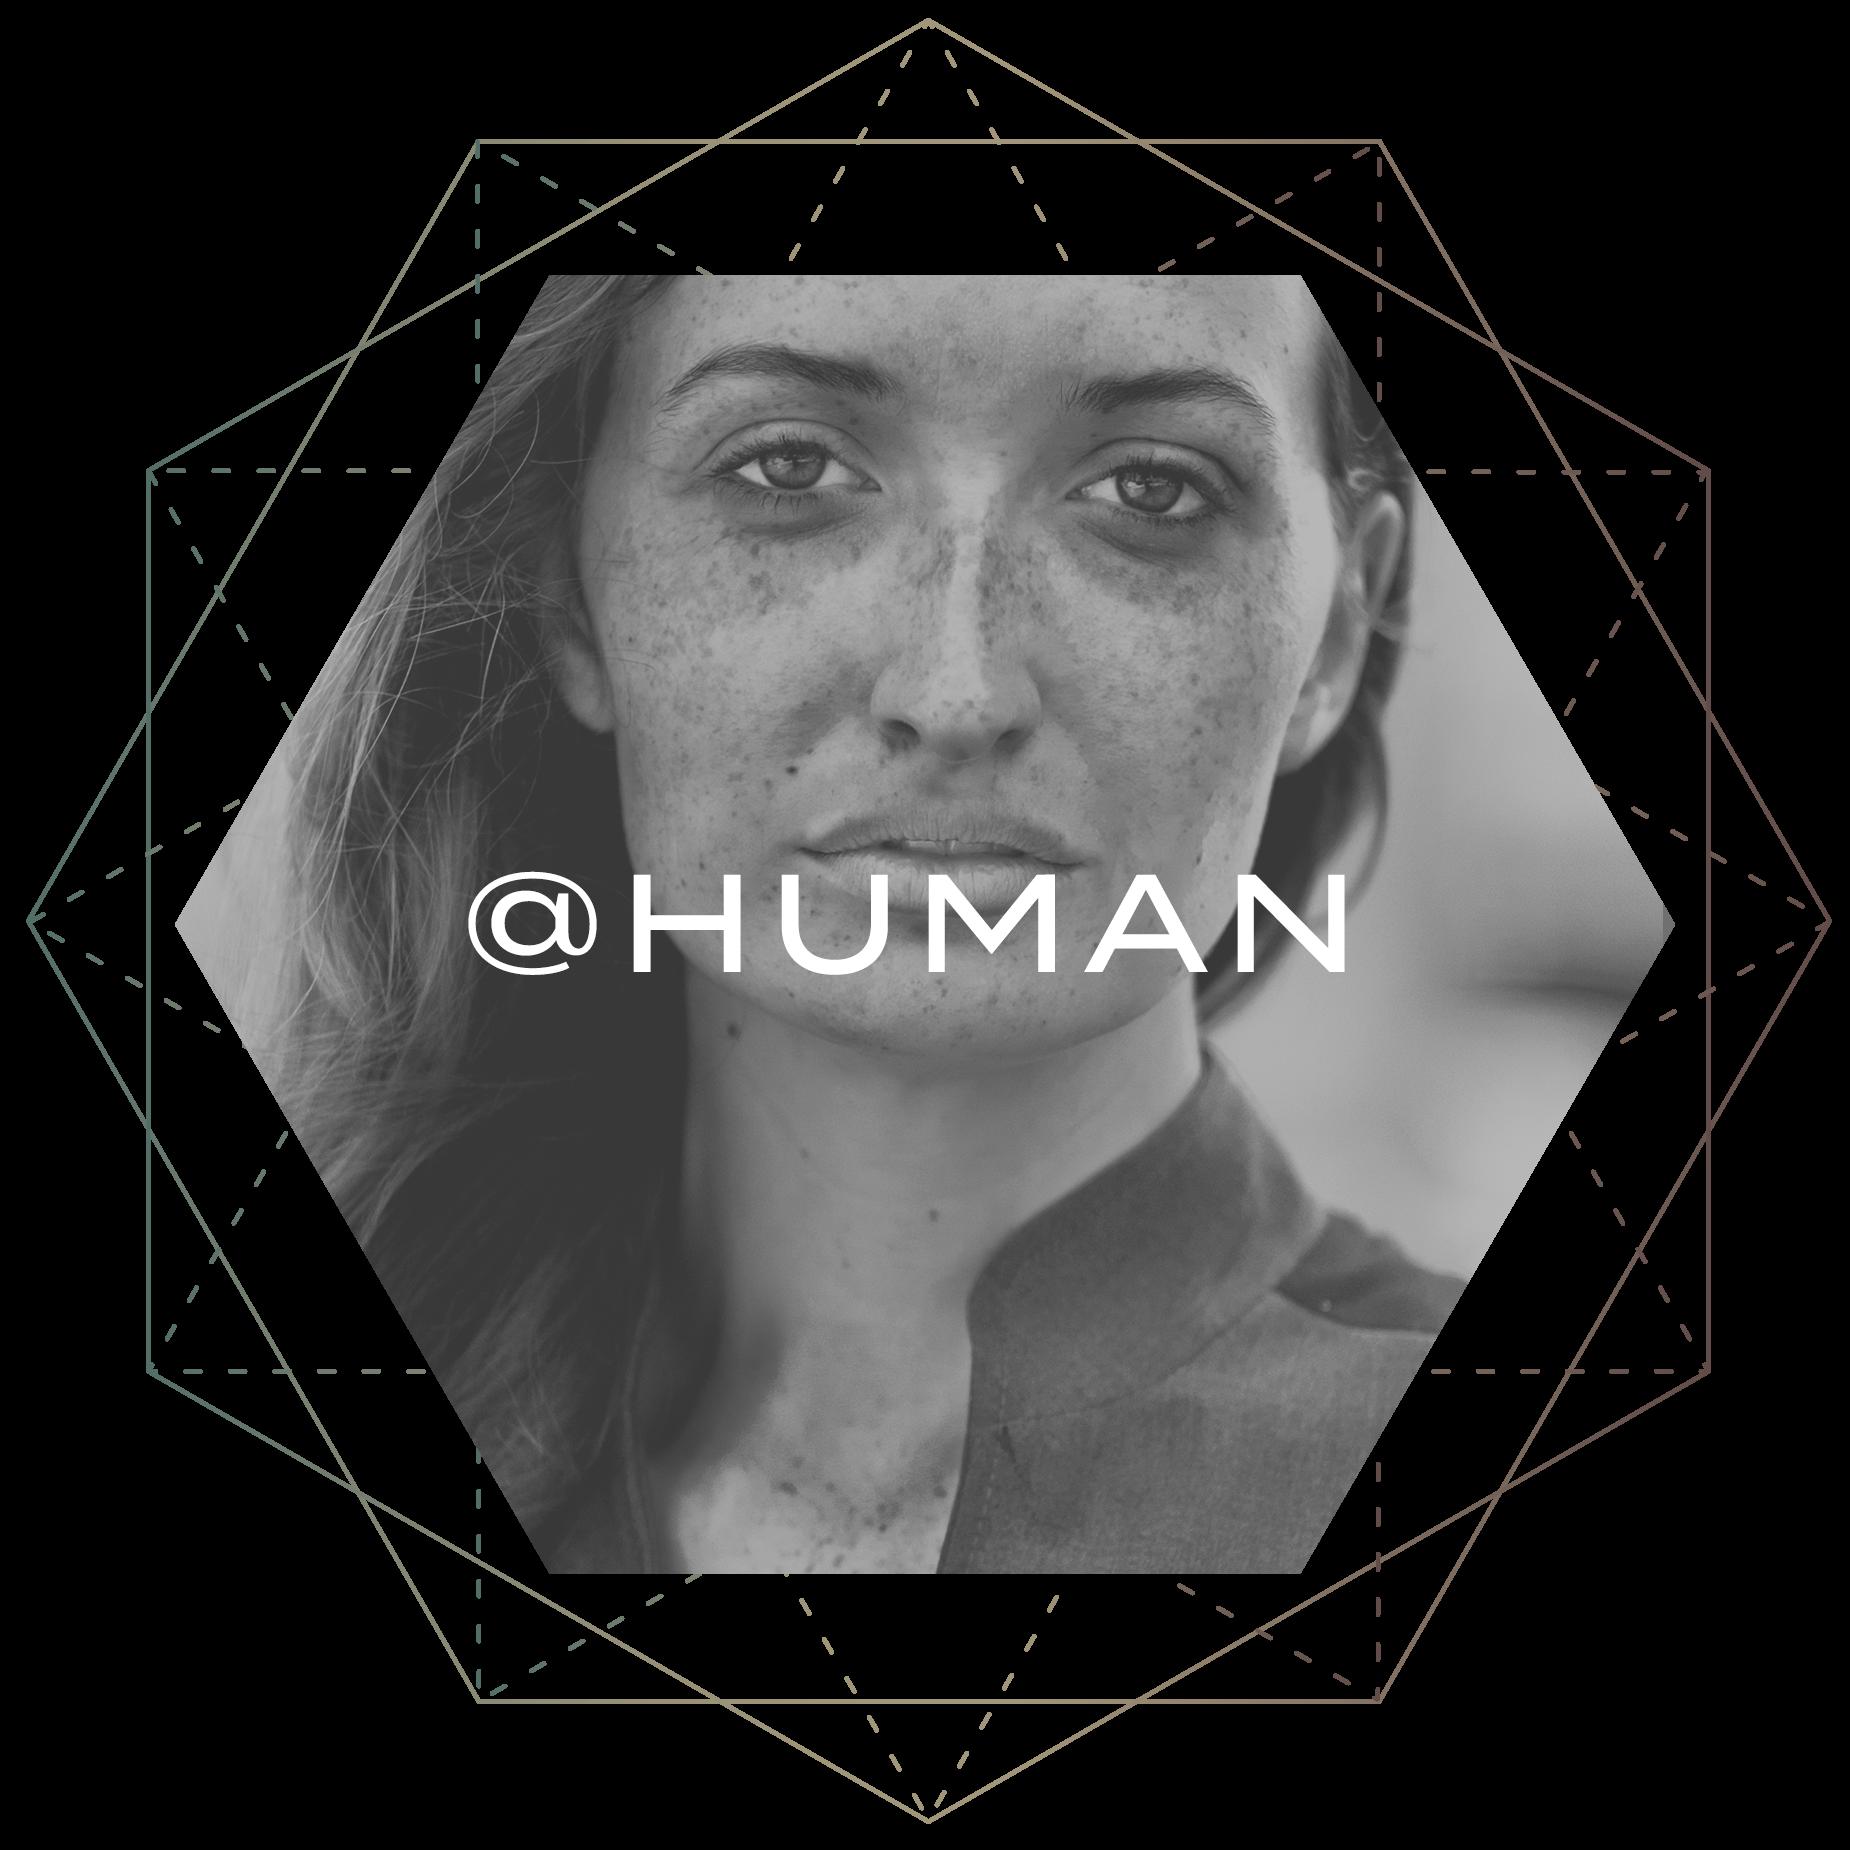 Humans-3